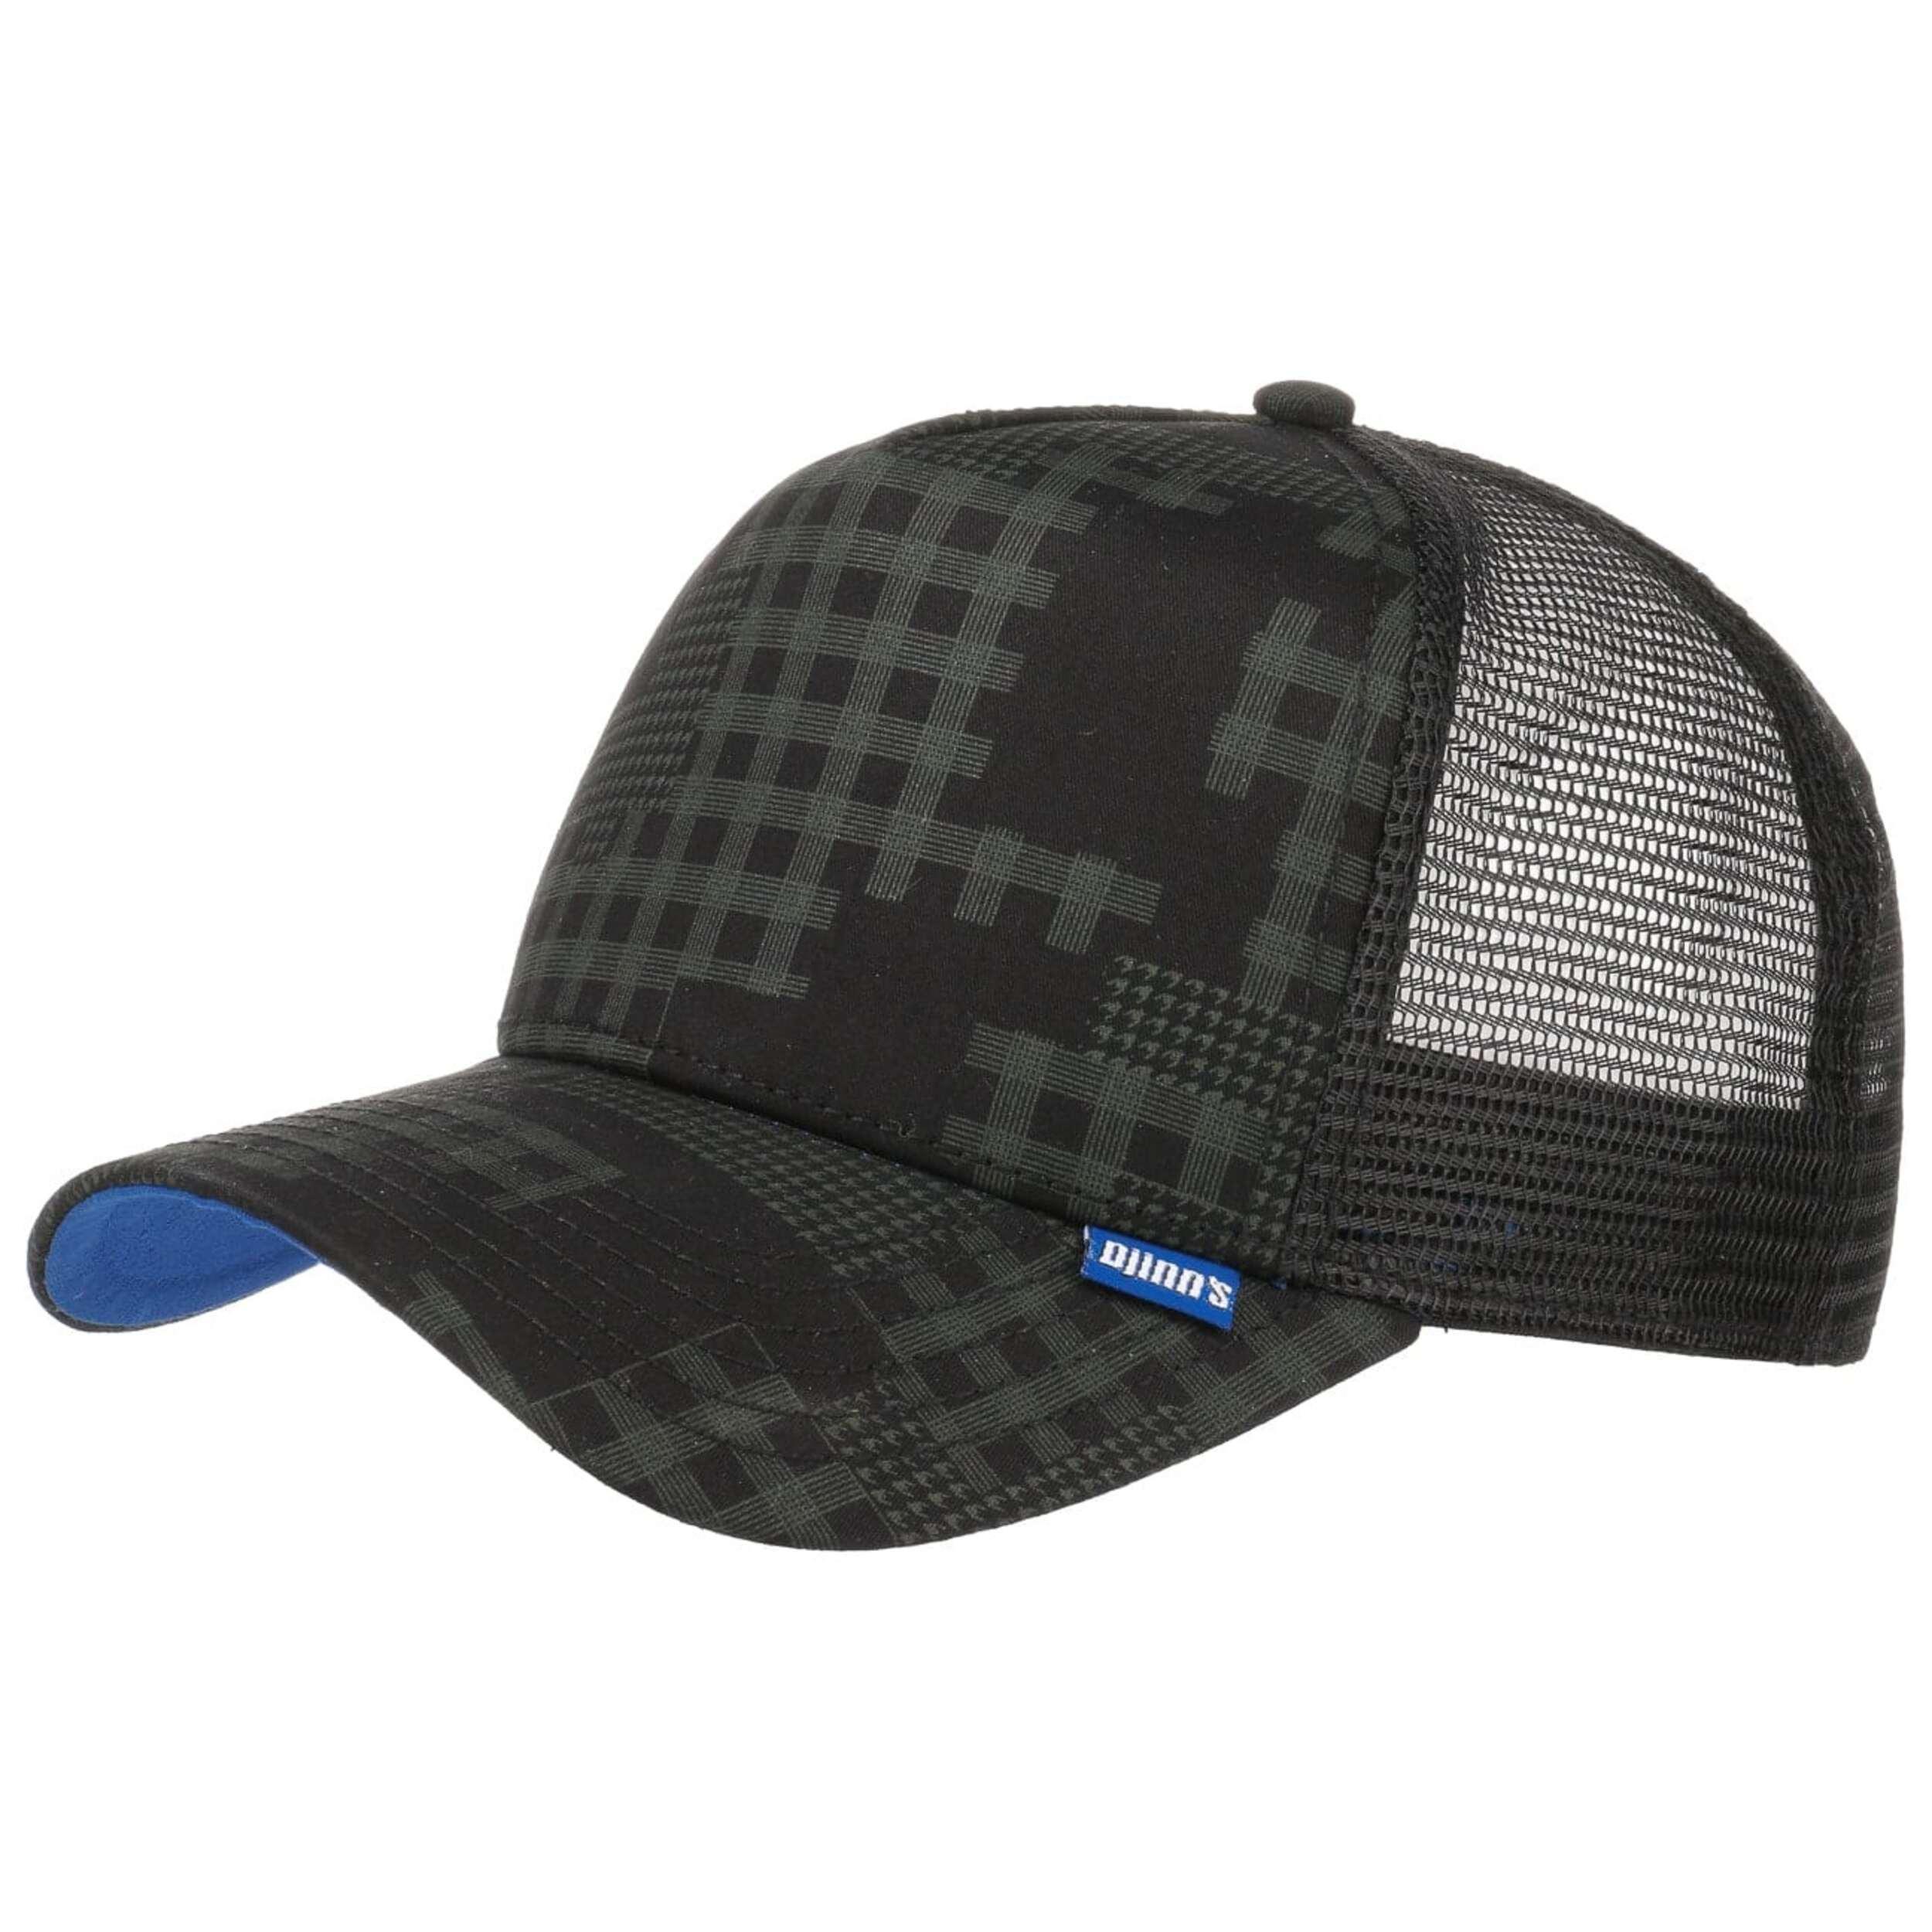 camou trucker cap by djinns eur 19 99 hats caps. Black Bedroom Furniture Sets. Home Design Ideas